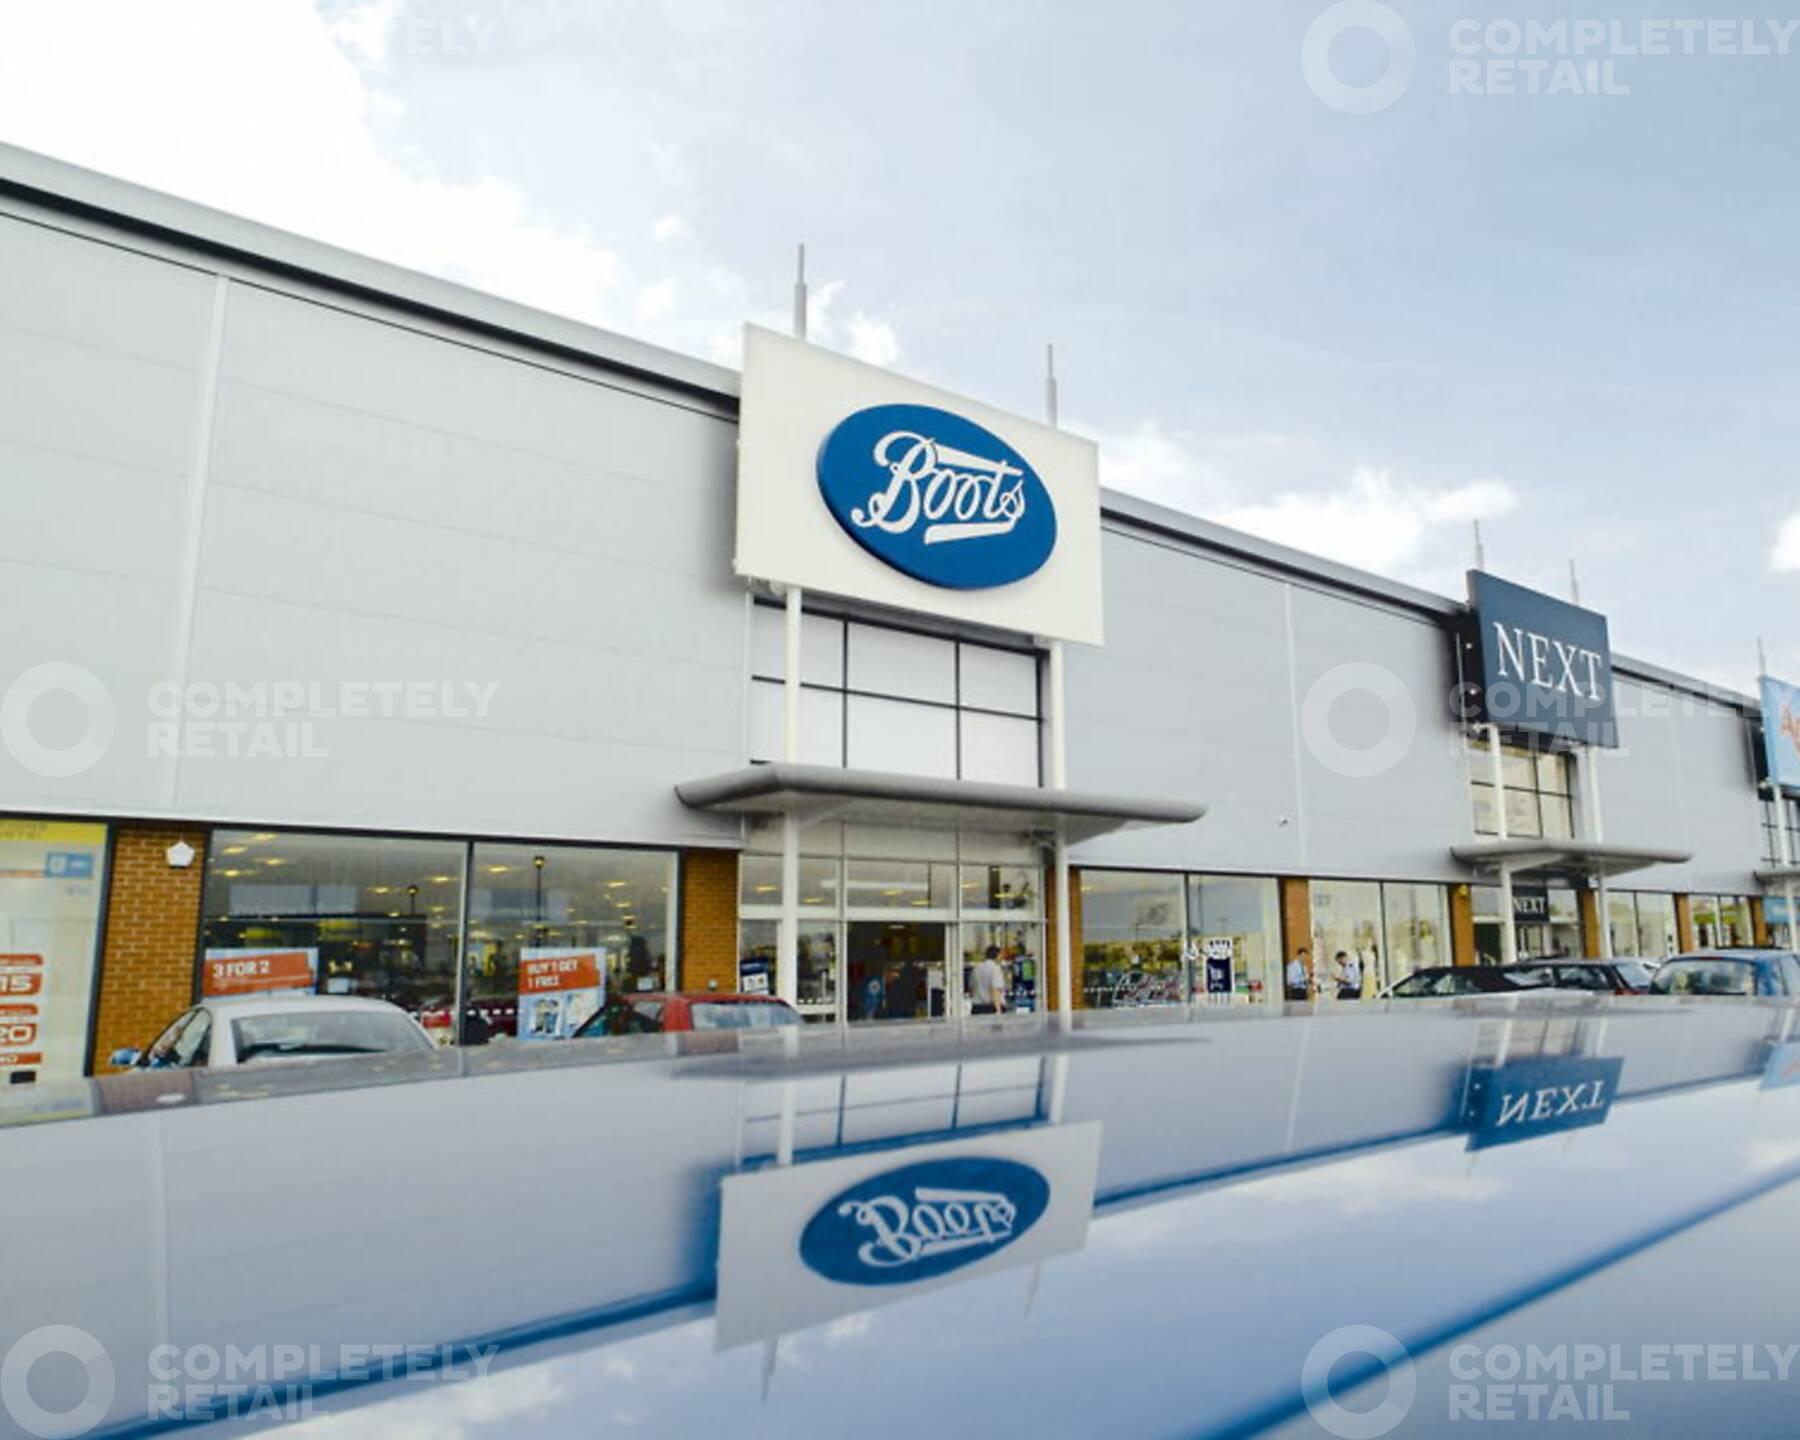 Cortonwood Retail Park